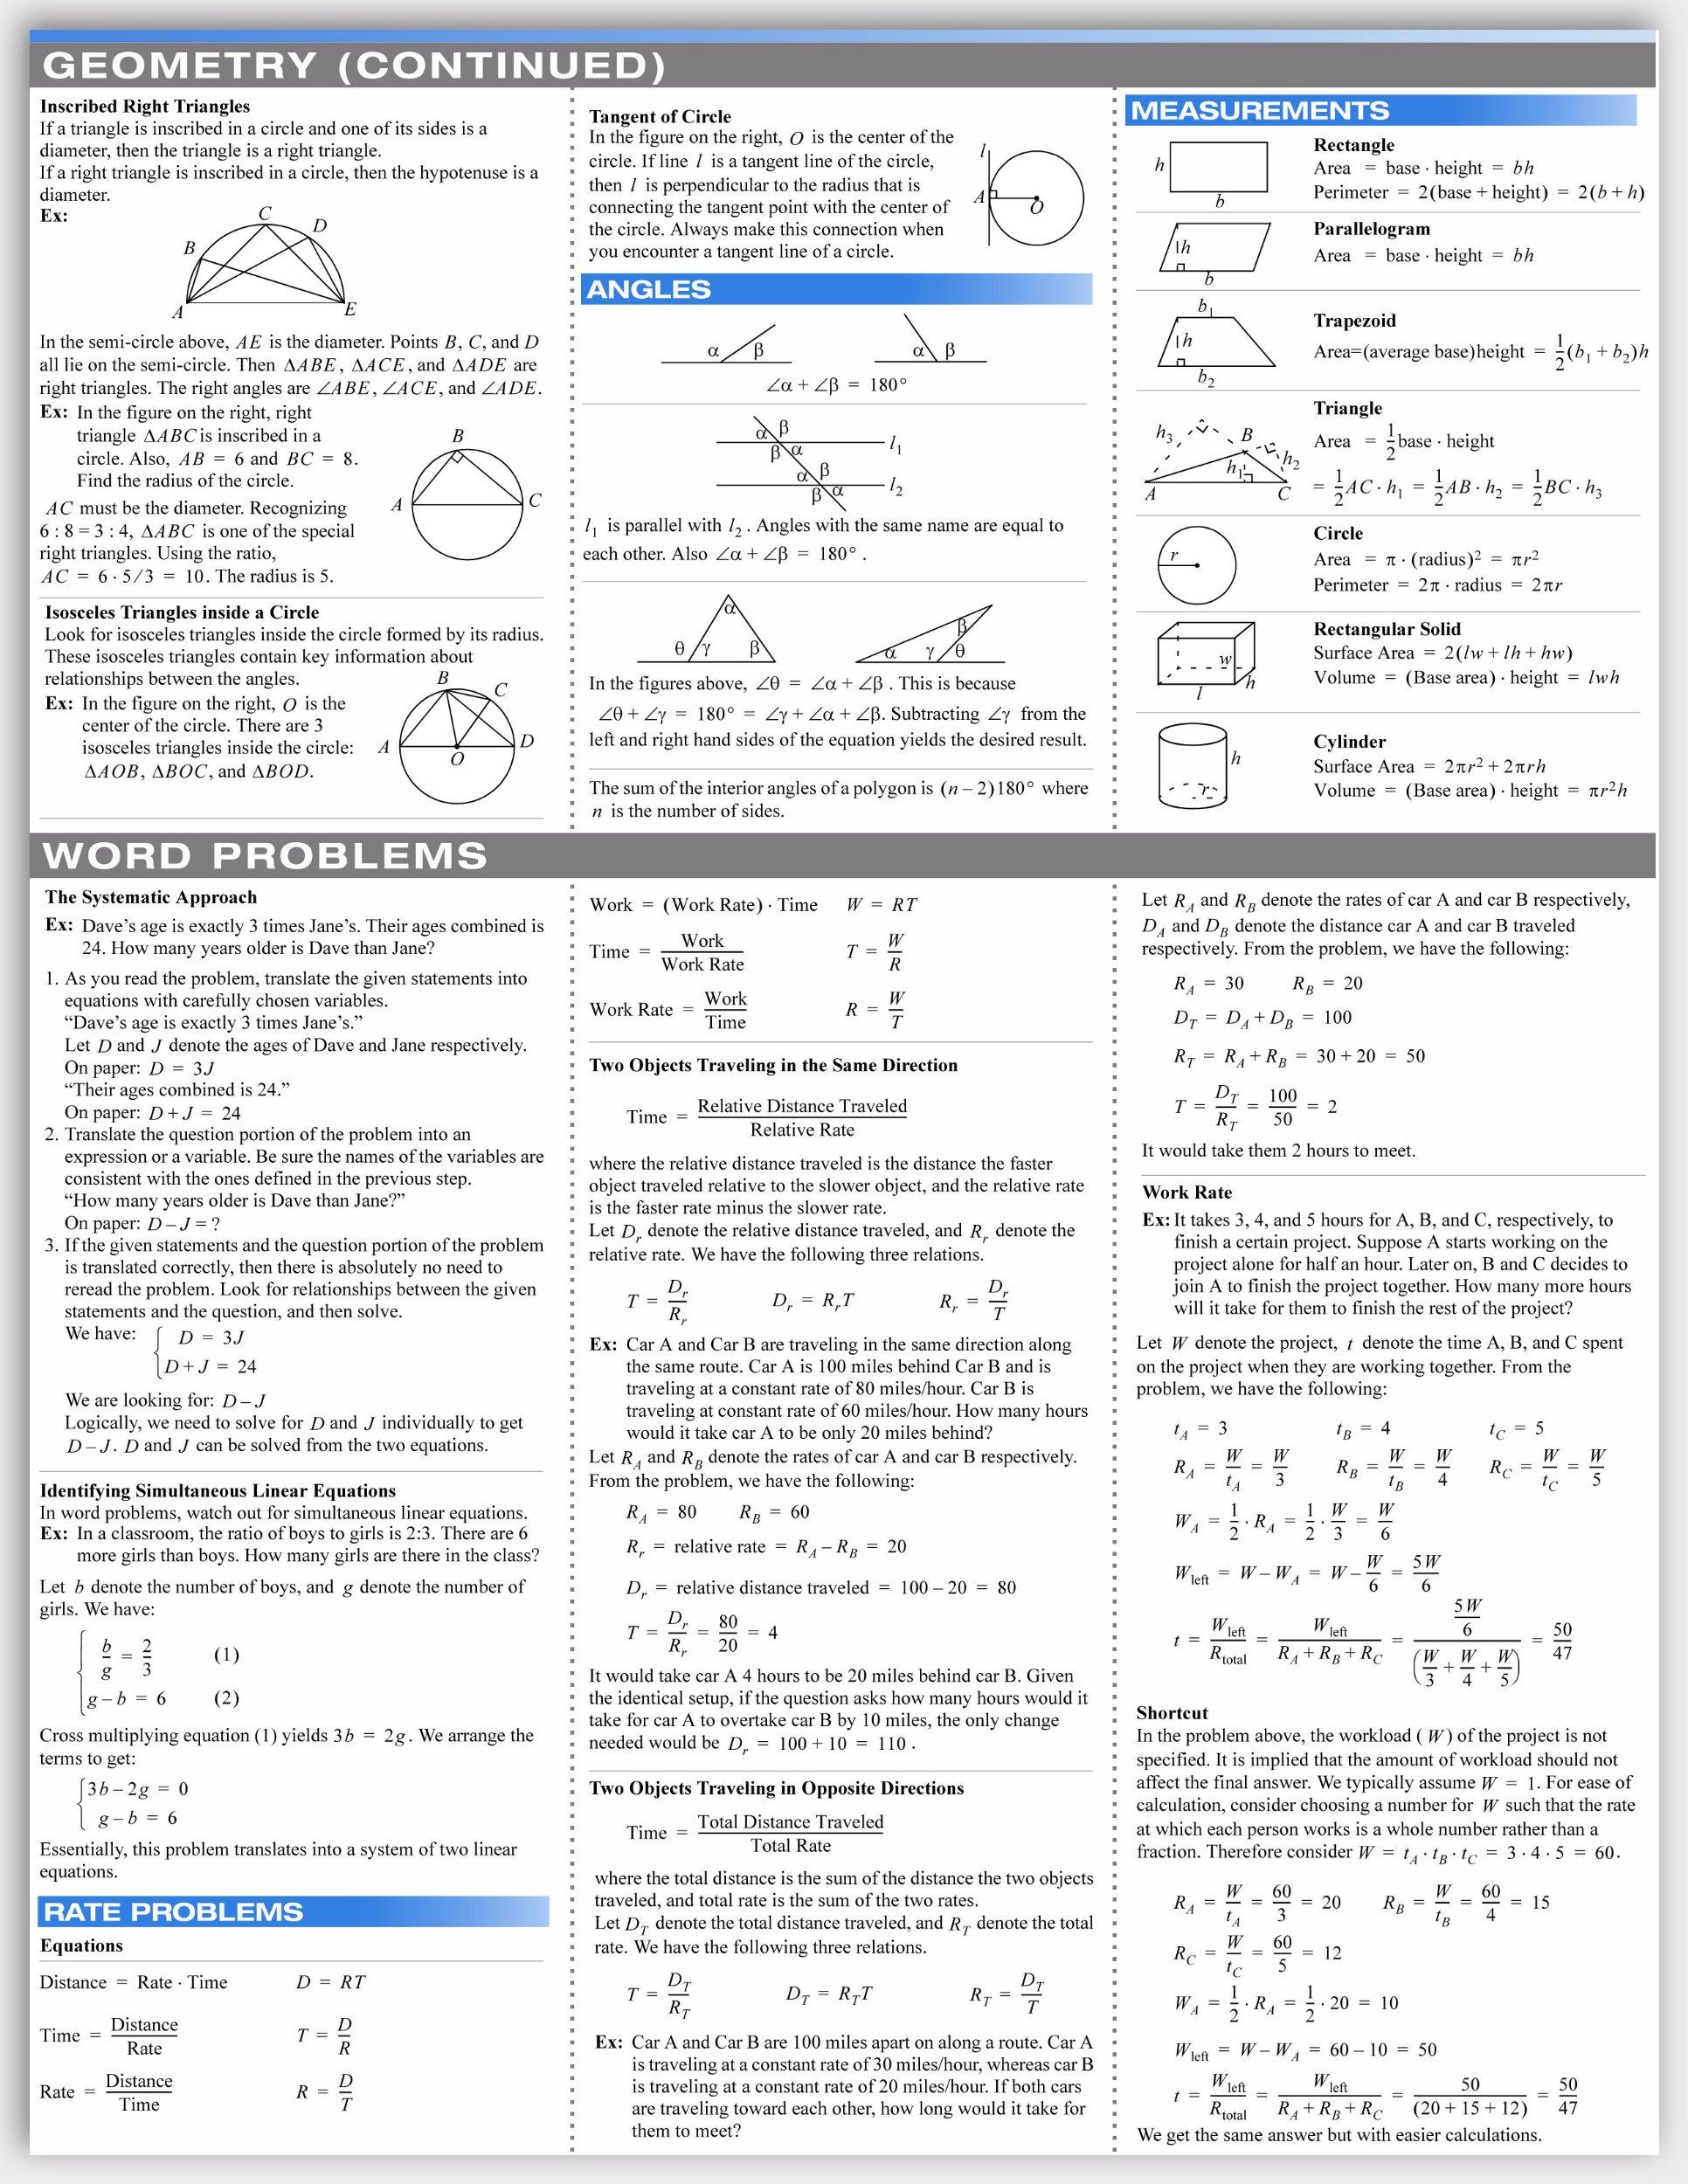 midterm fins2624 s1 2015 formula sheet